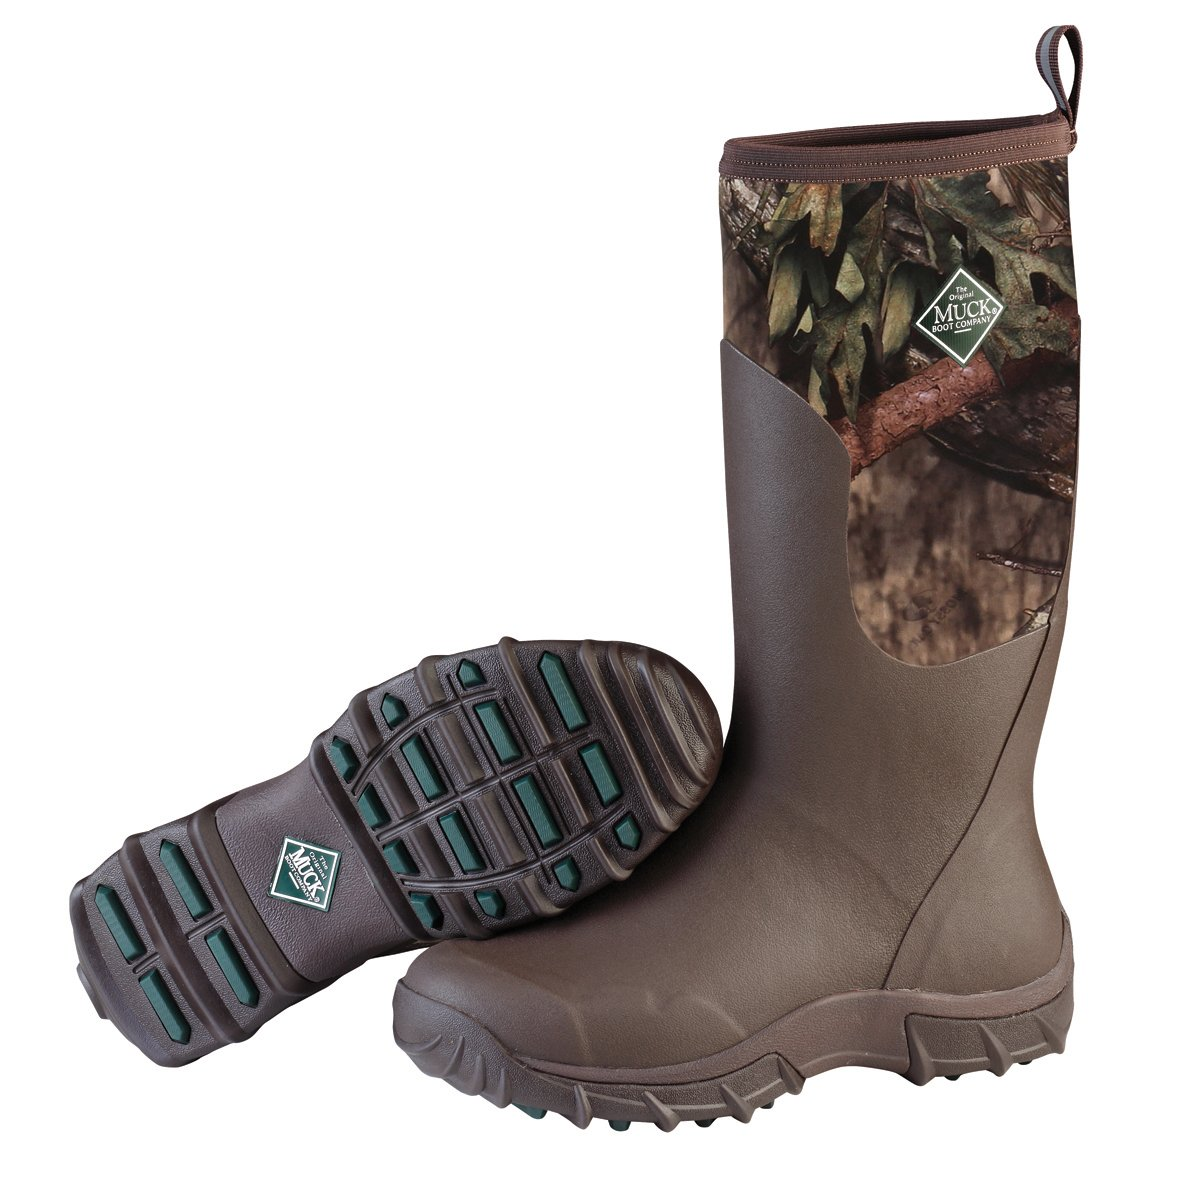 Muck Boot Men's Woody Sport II Hunting Shoes, Bark/Mossy Oak, 10 US/10-10.5 M US